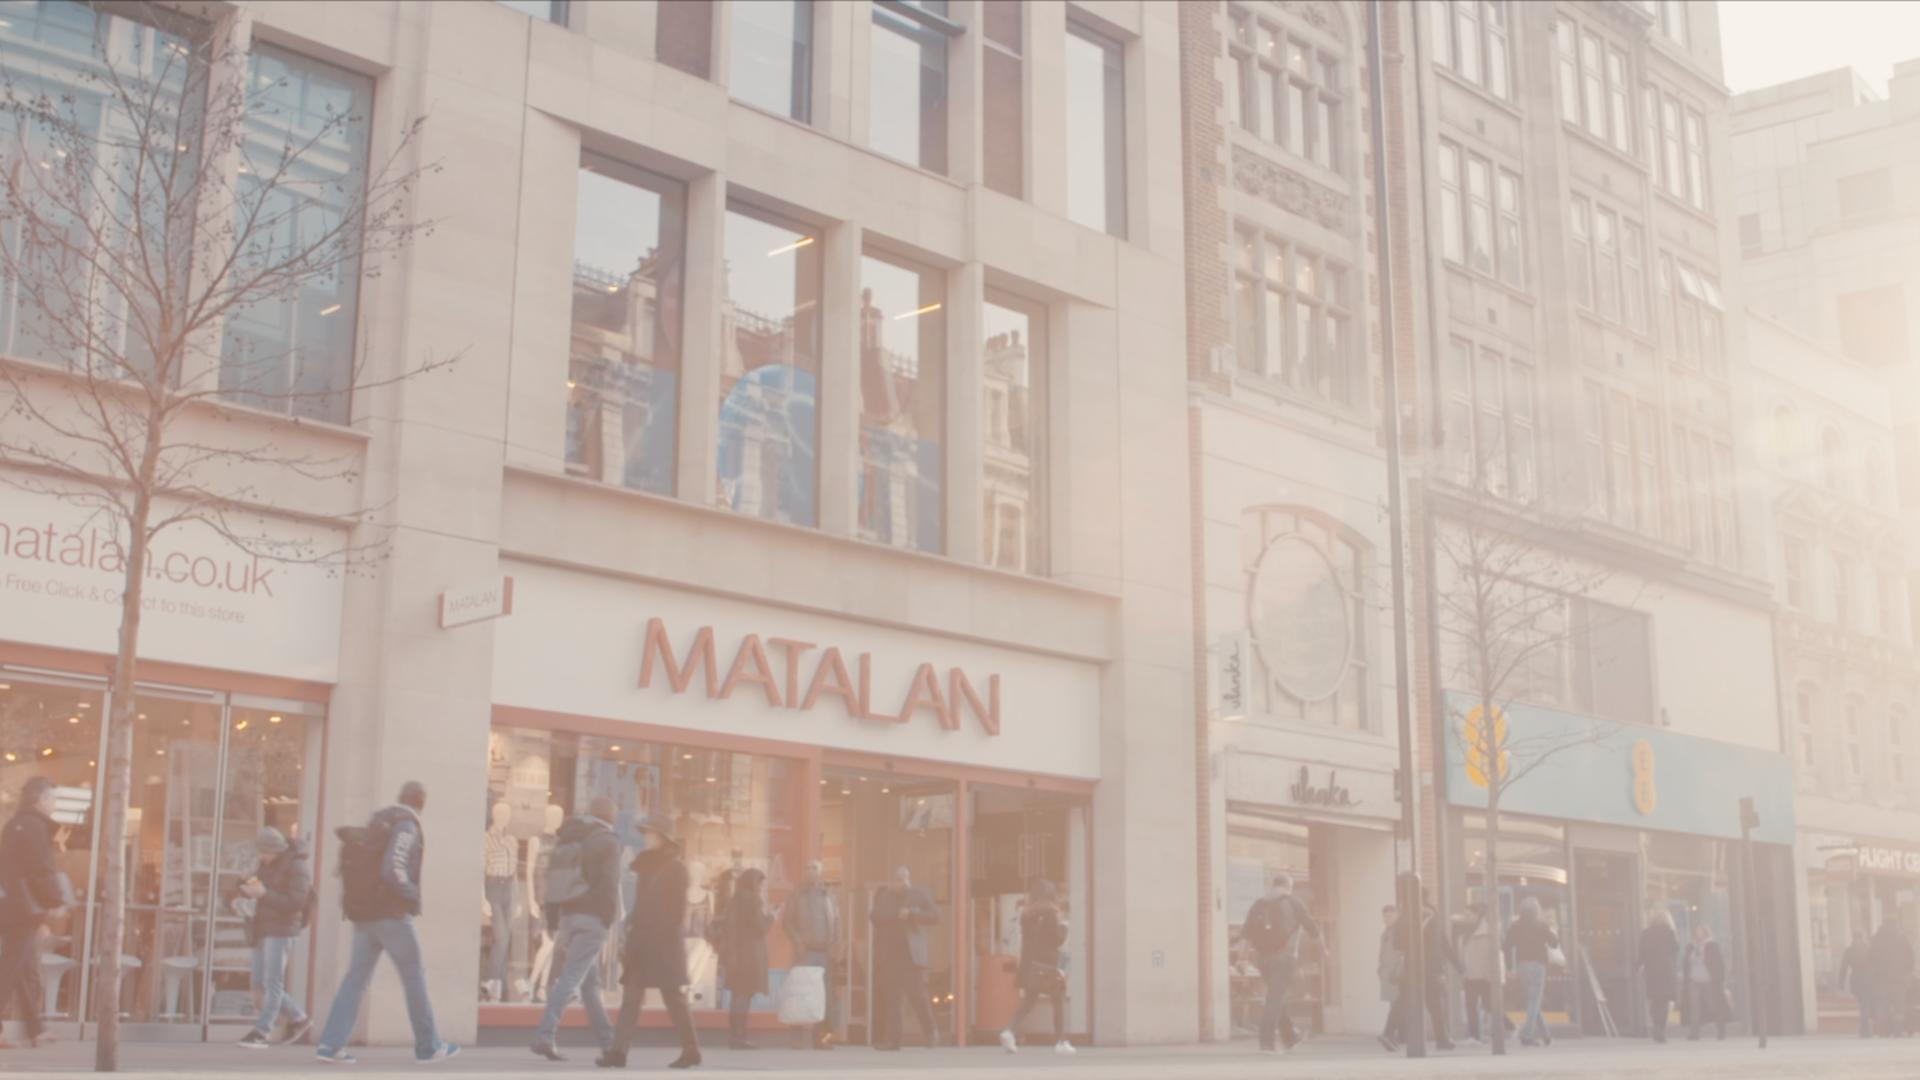 Matalan - Oxford street launch event